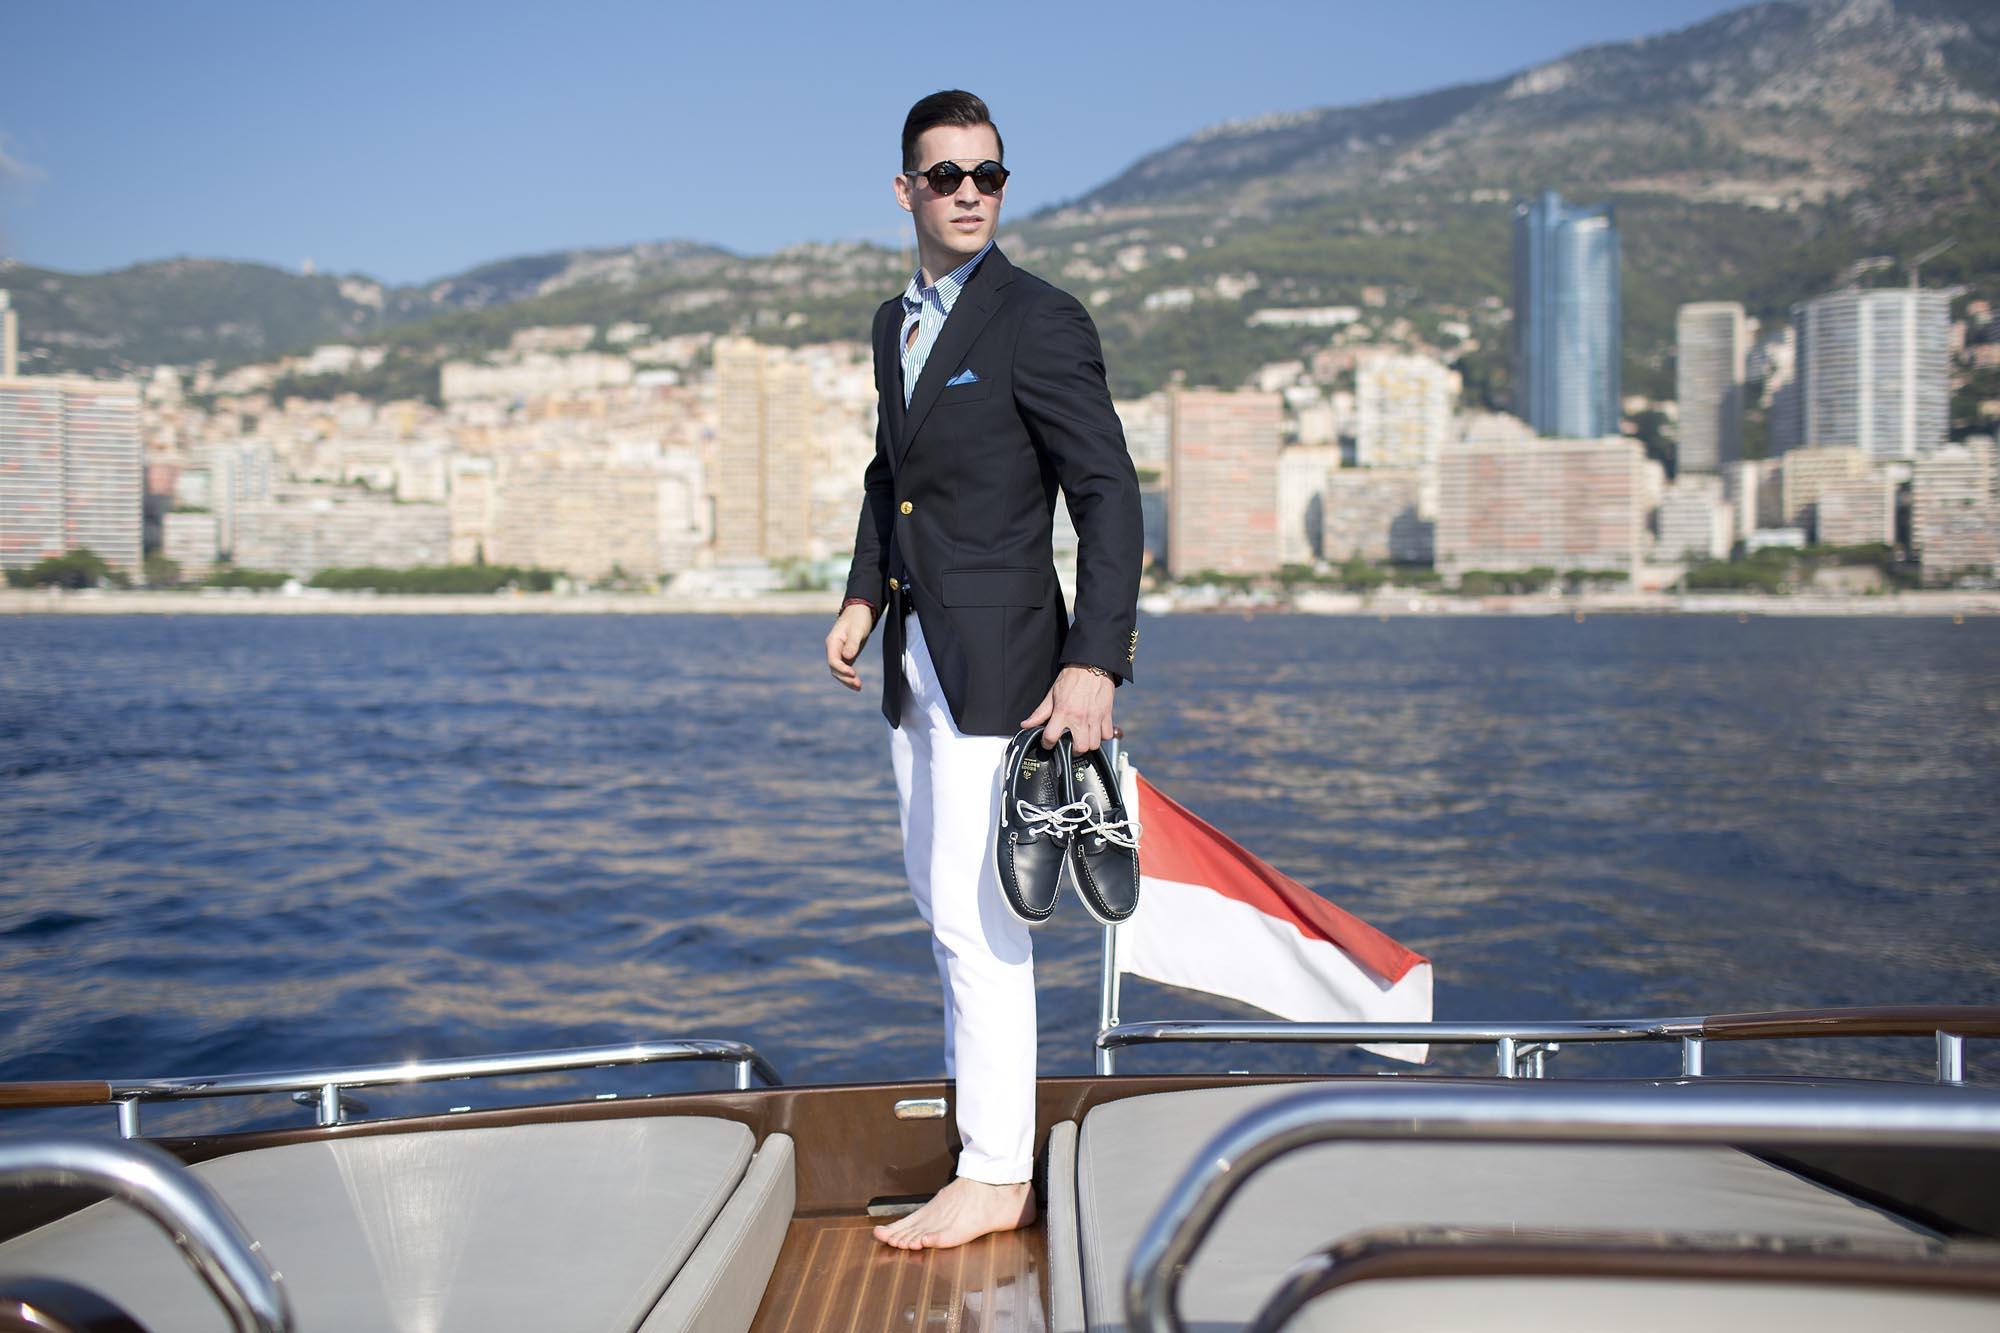 Riva Yacht Brooks Brothers Luxury Fashion Monte Carlo Yacht Charter Superyacht News